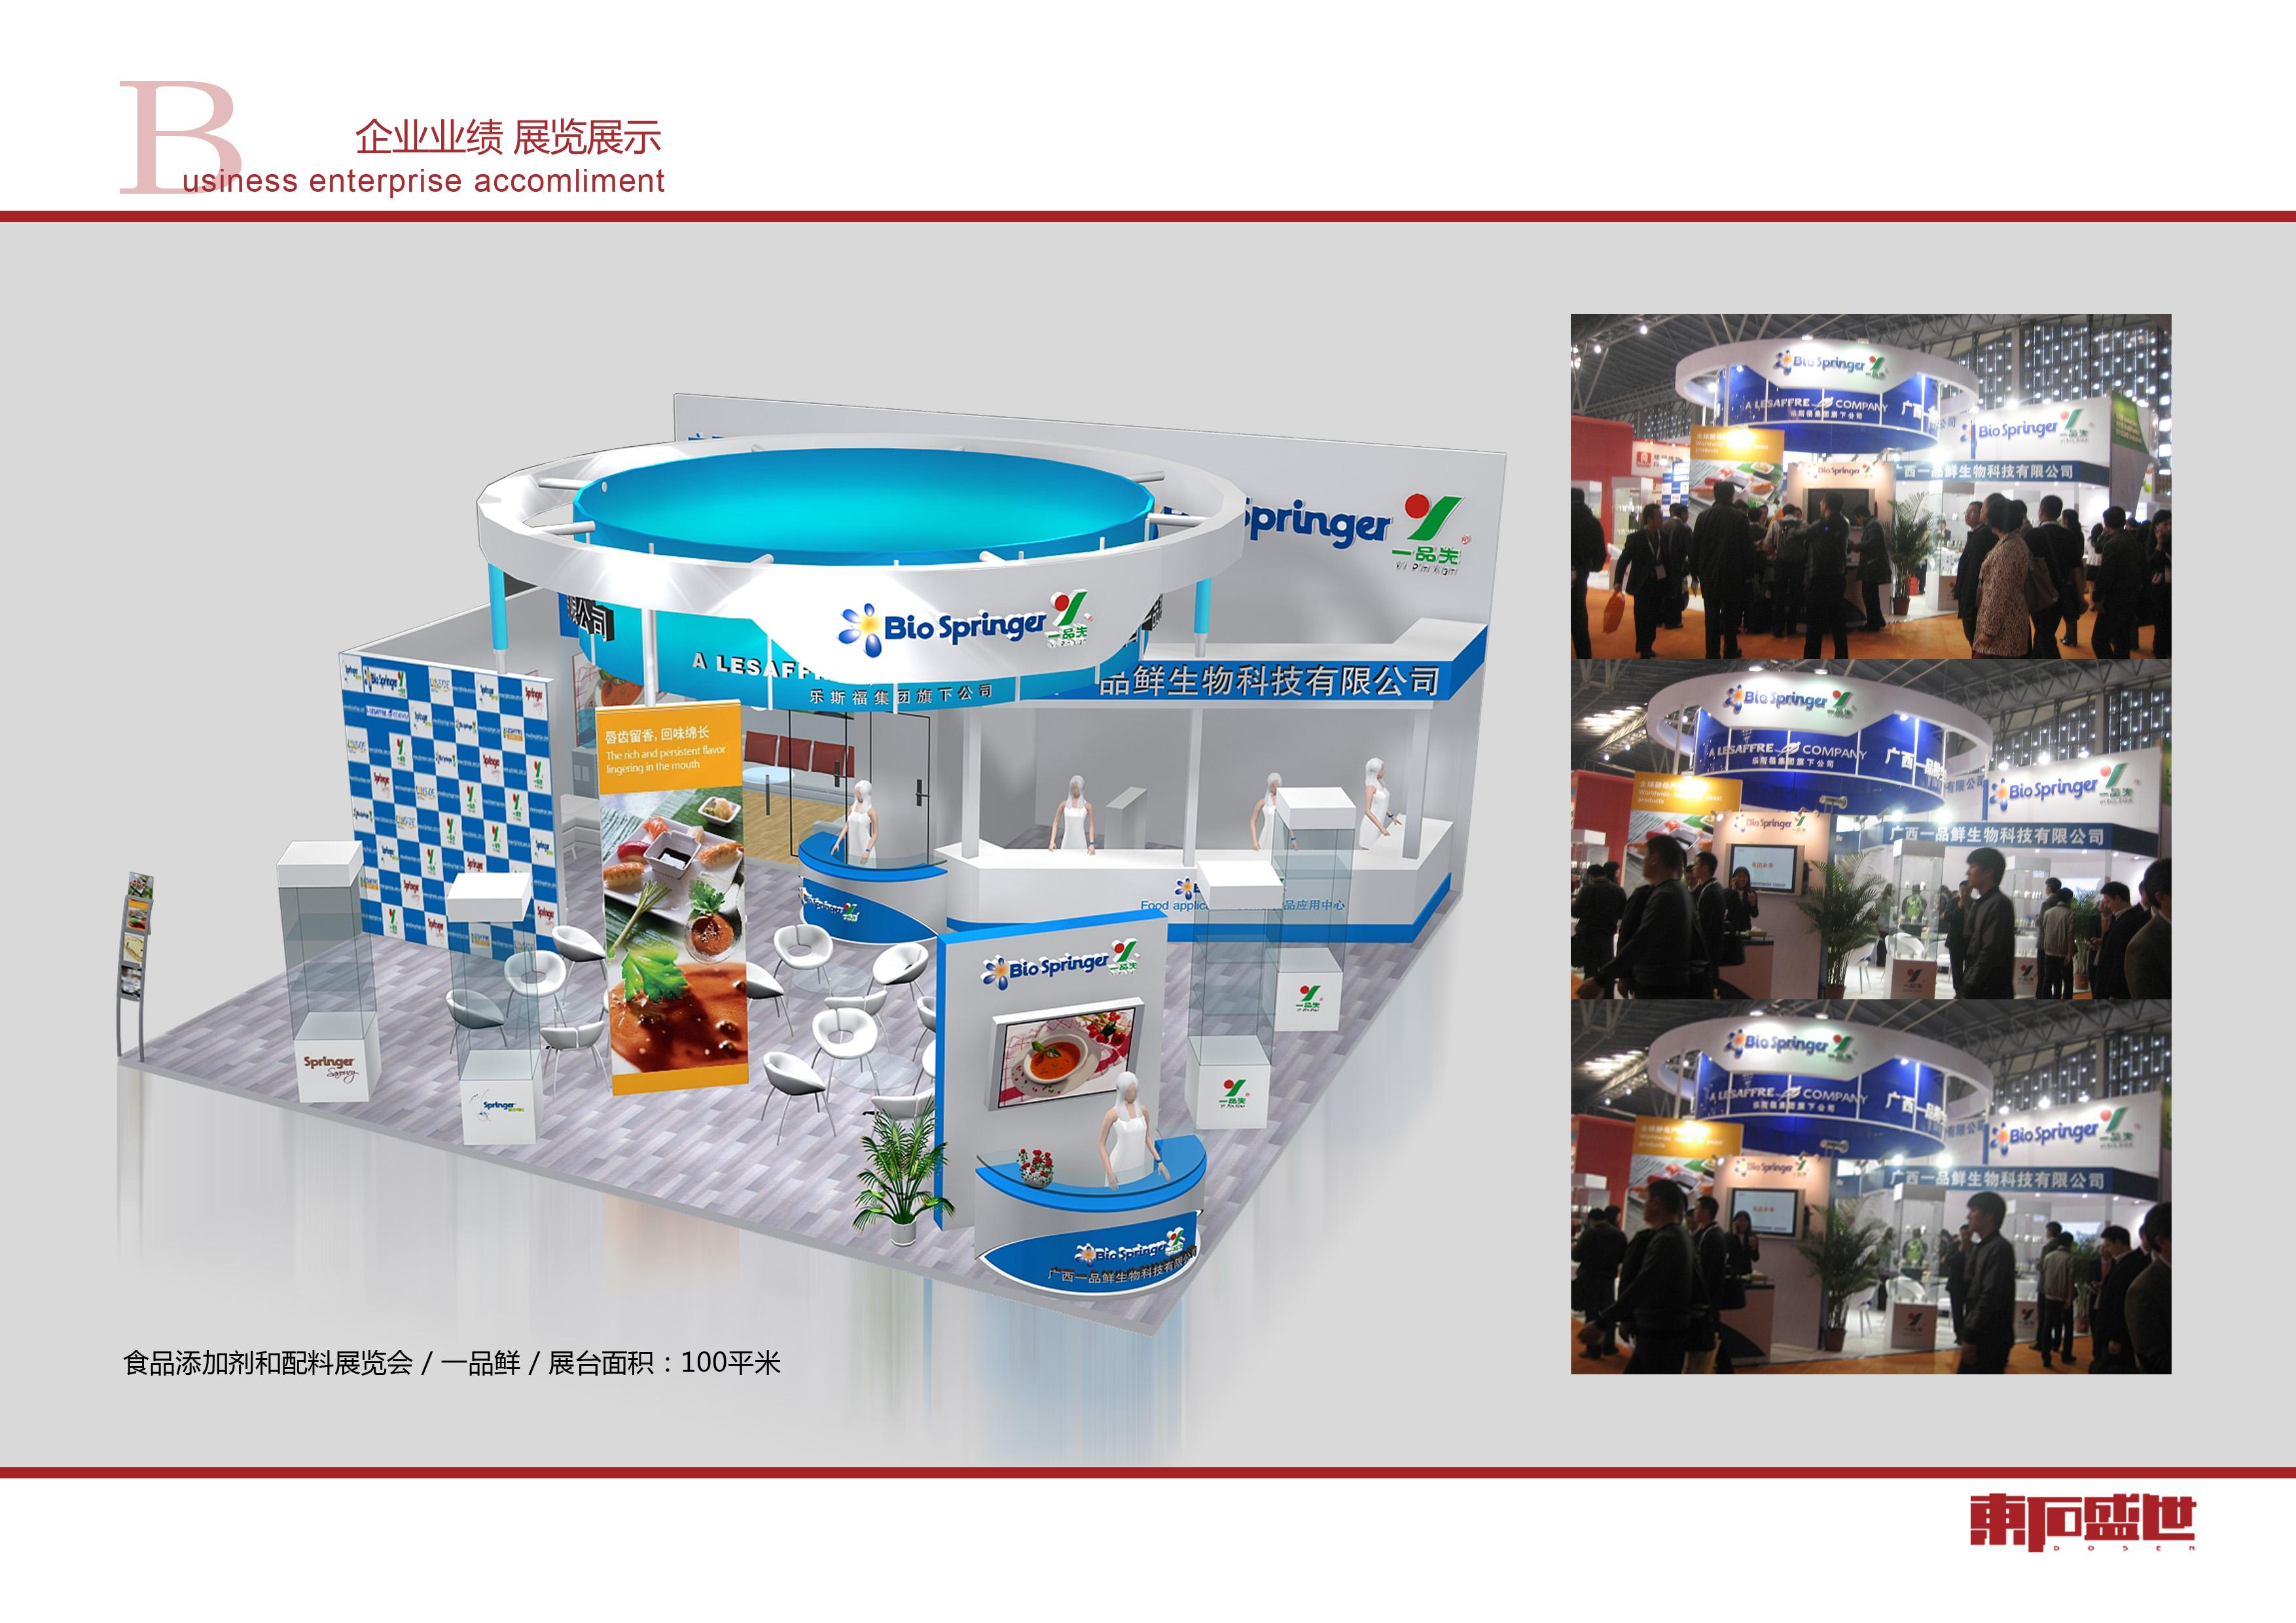 Exhibition Booth Activities : Exhibition service beijing dosen international exhibition co ltd